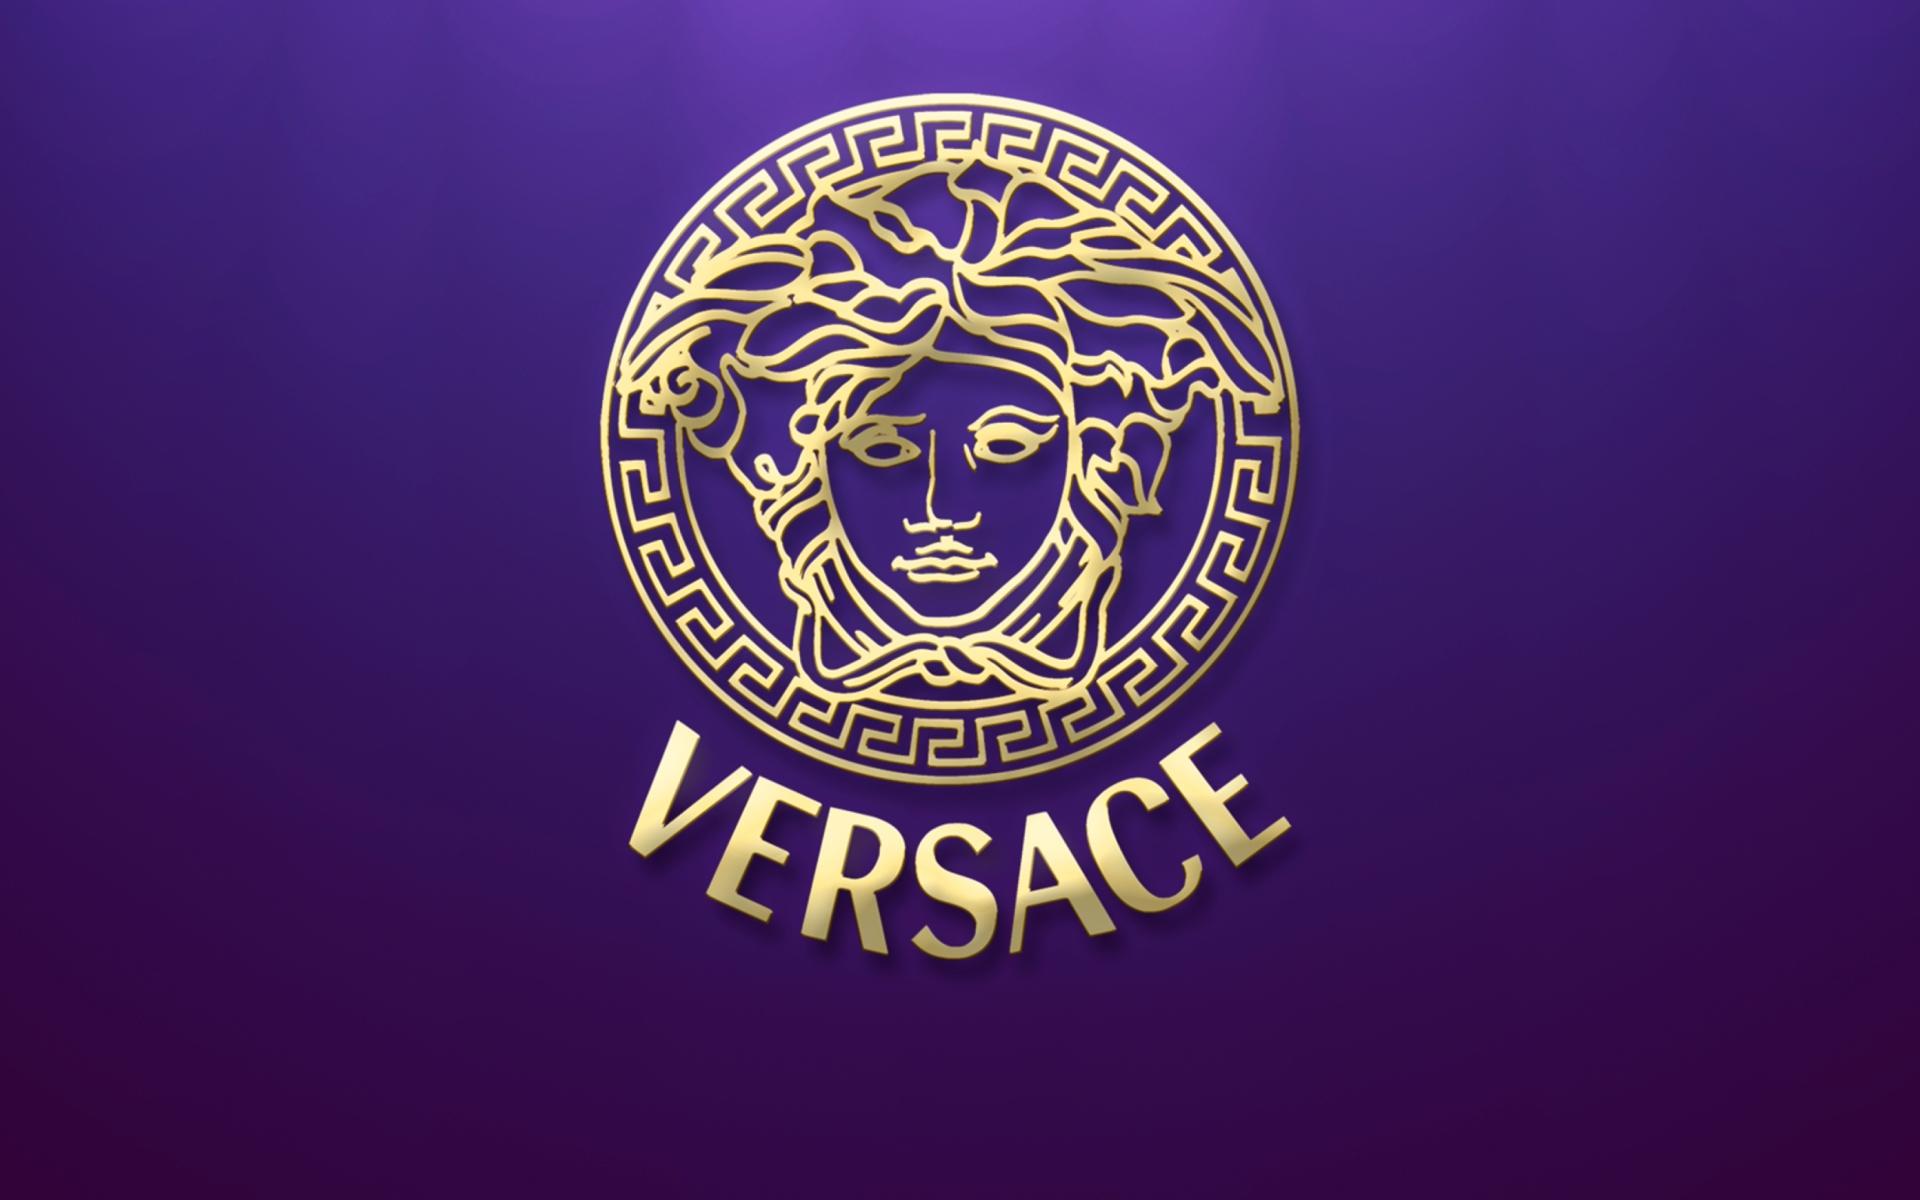 download ferrari logo mobile wallpaper